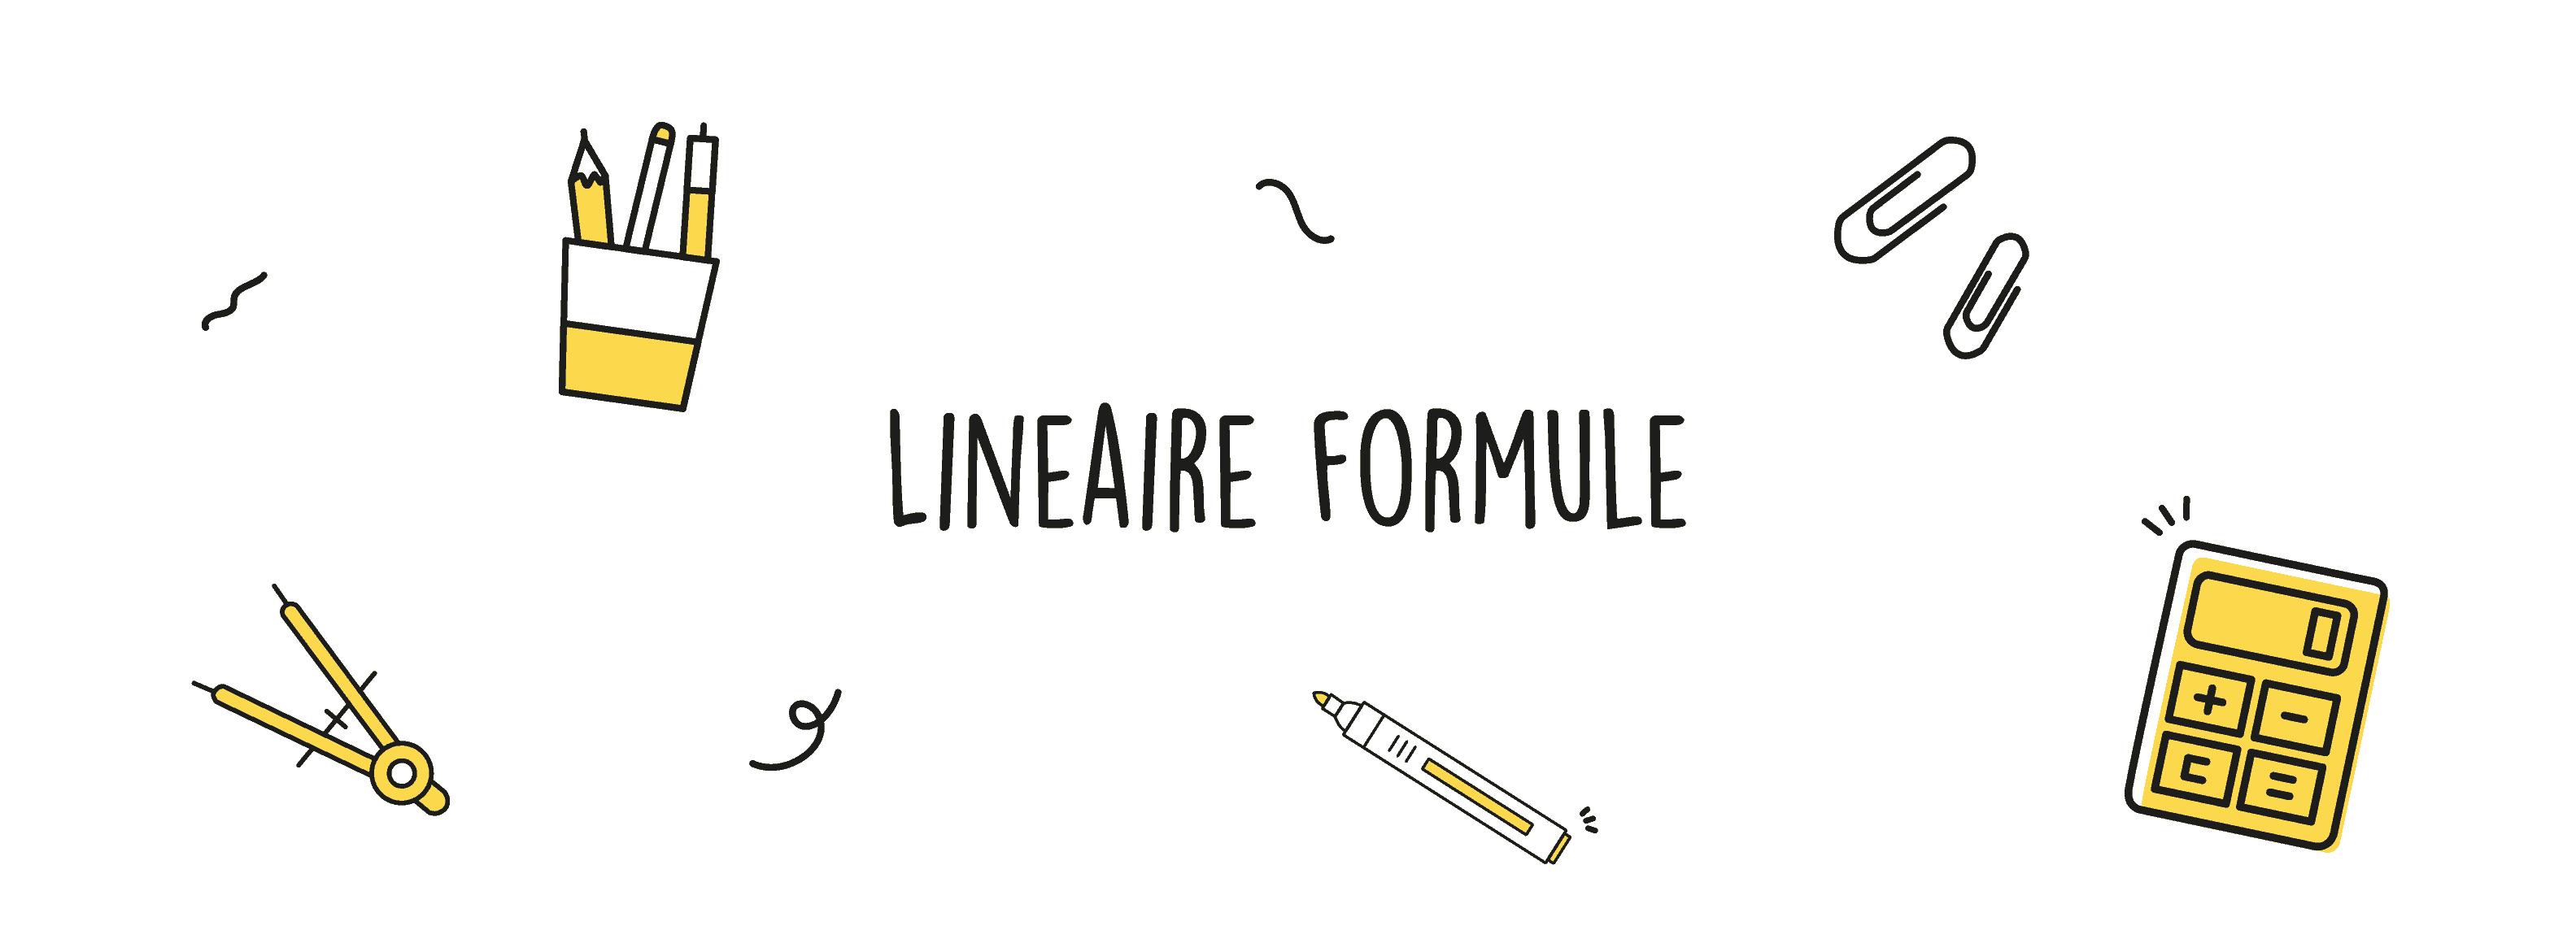 Lineaire formule